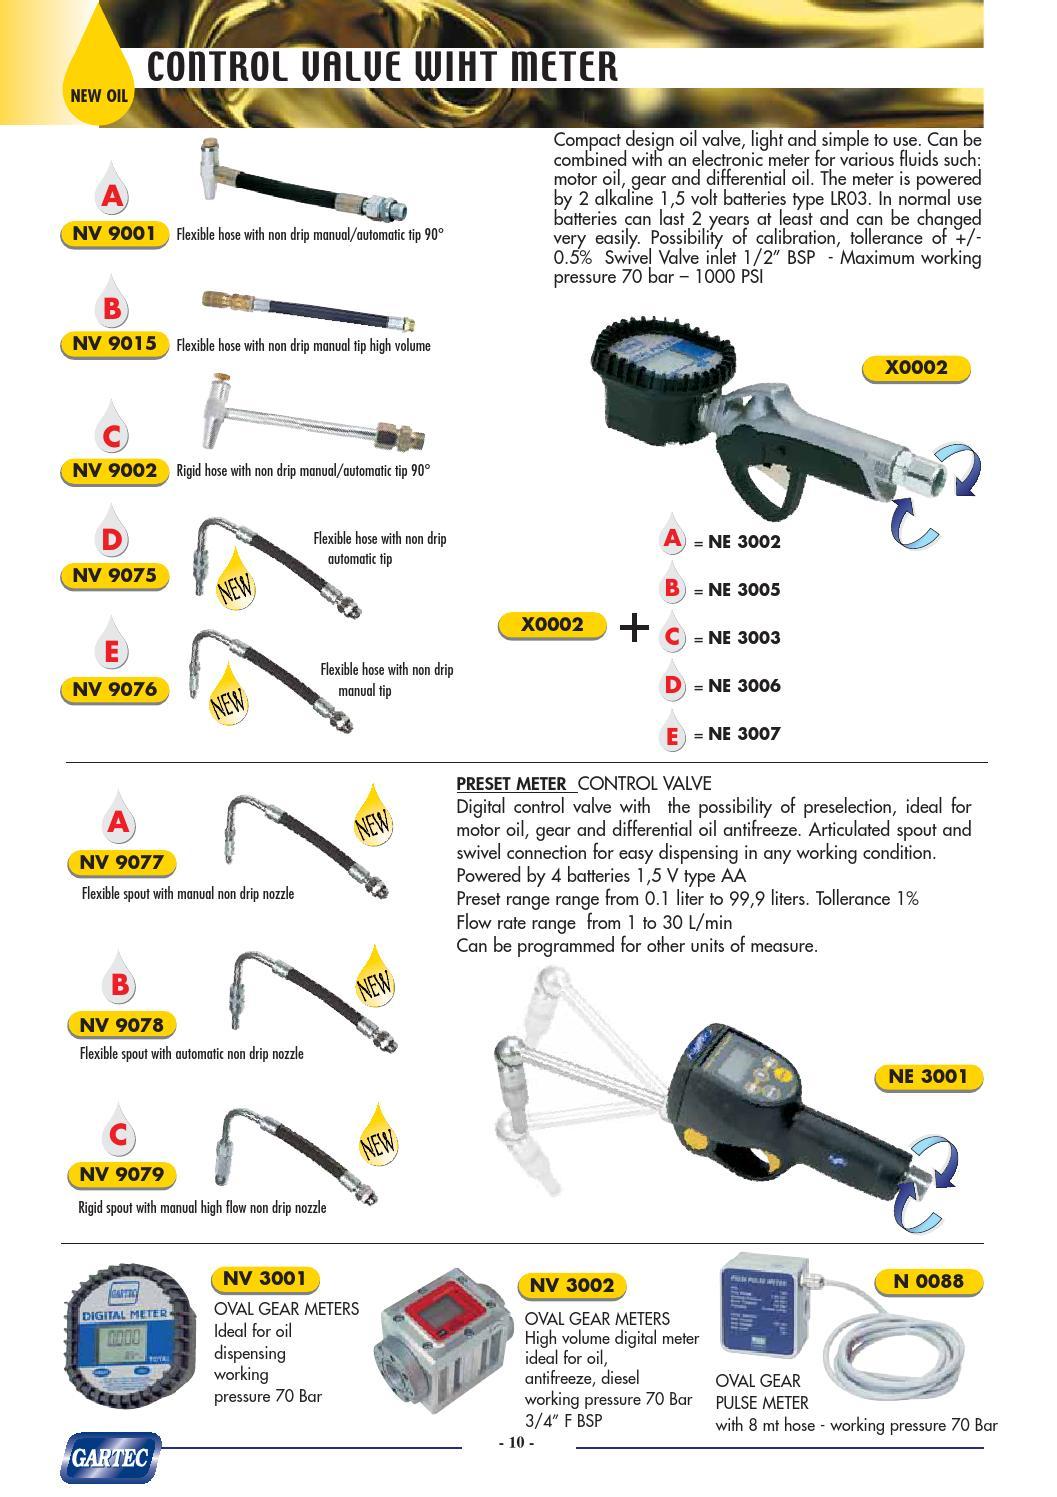 Gartec catalogus by Chrisel FluidTechnics - issuu